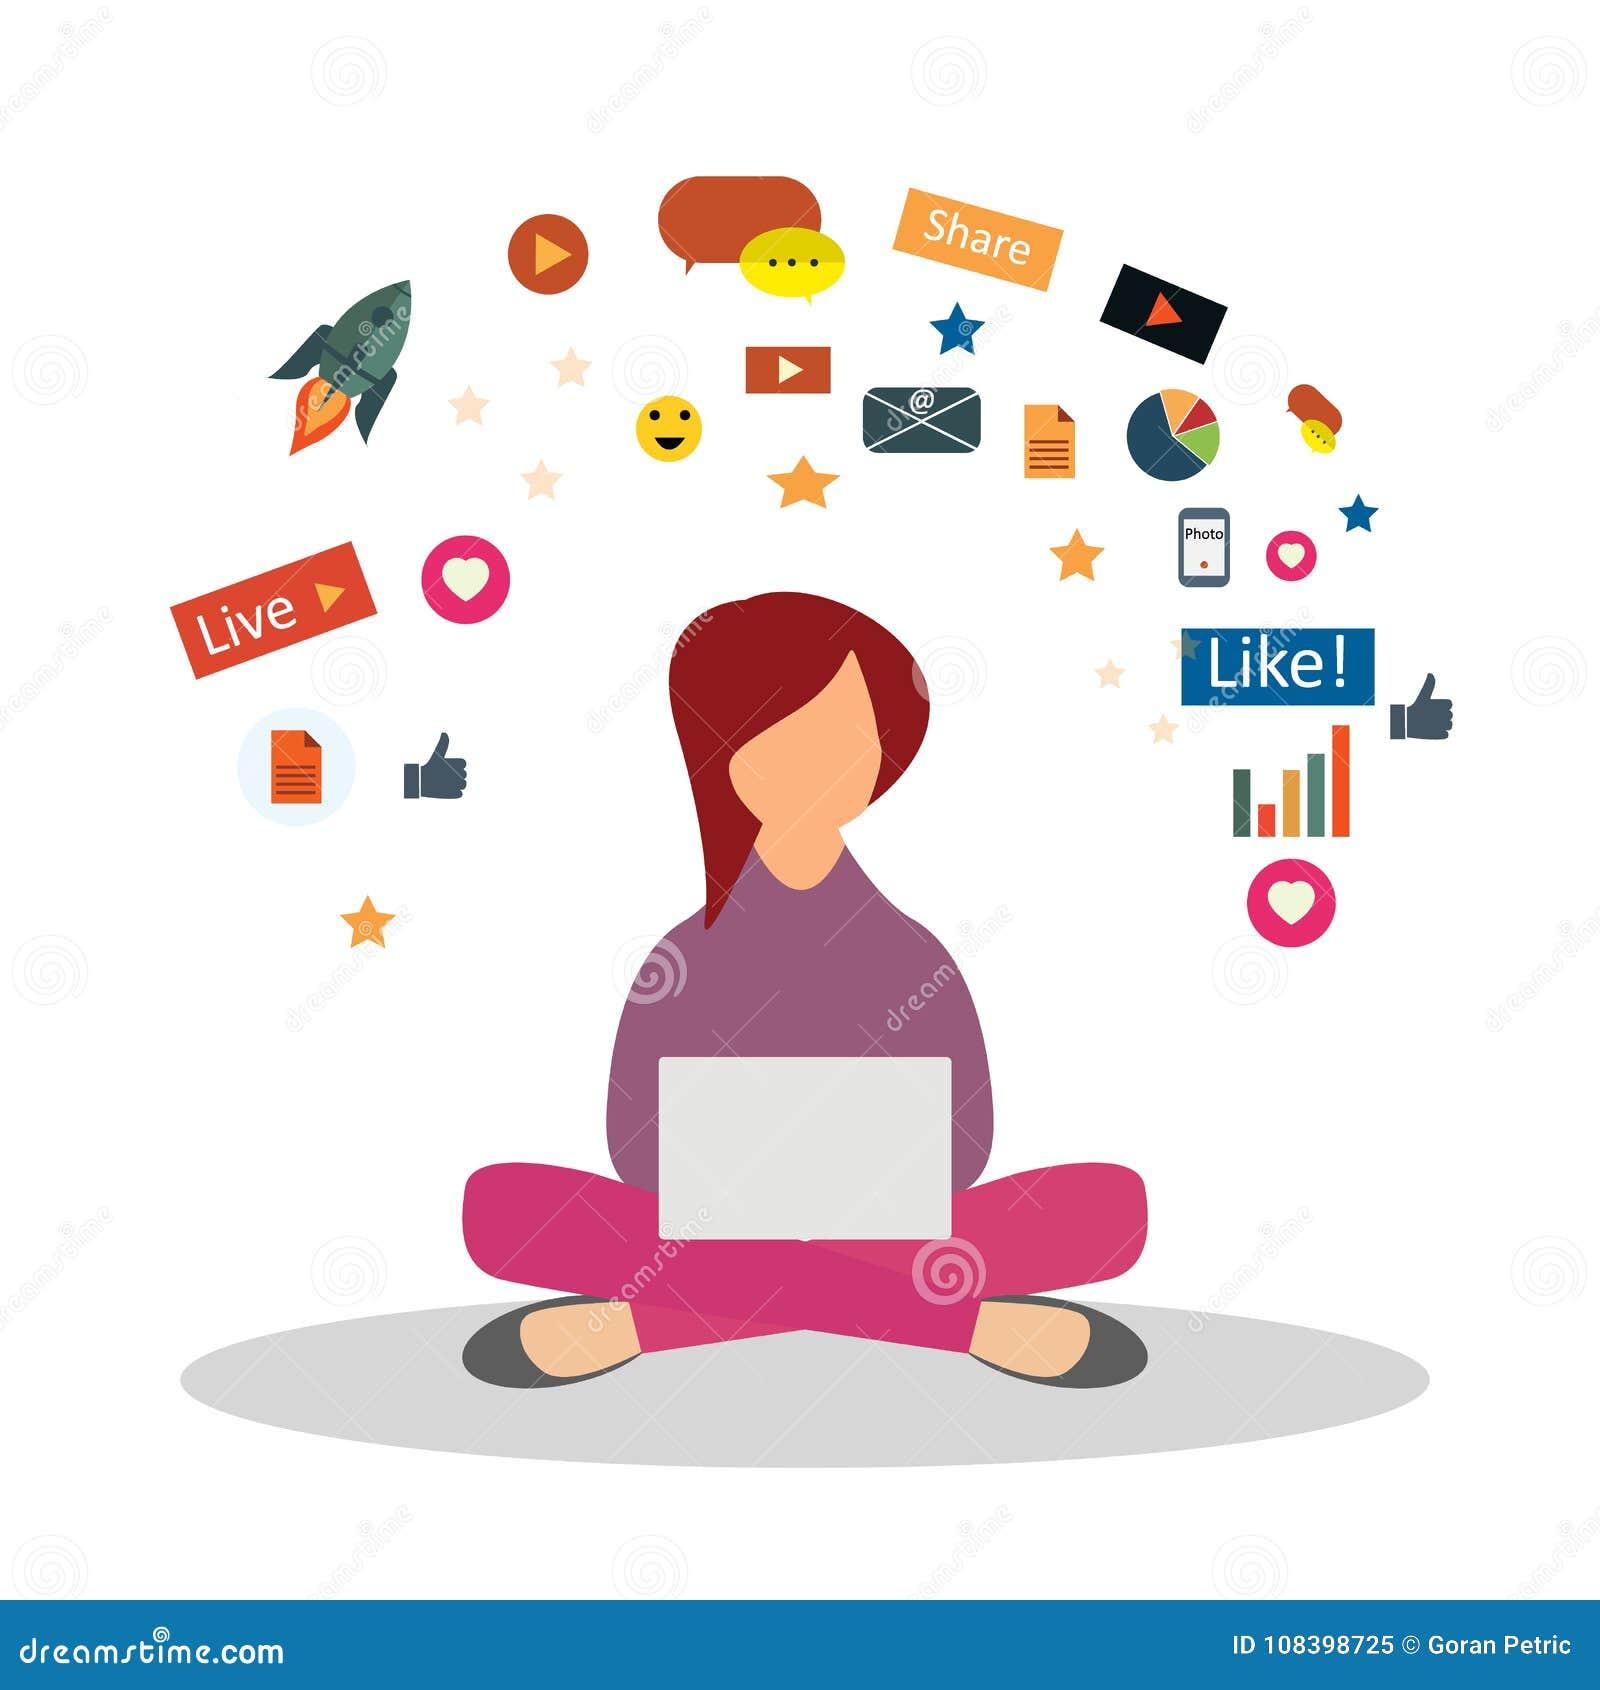 Digital Marketing Specialist Practicing Yoga Digital Marketing Concept Stock Illustration Illustration Of Commerce Media 108398725